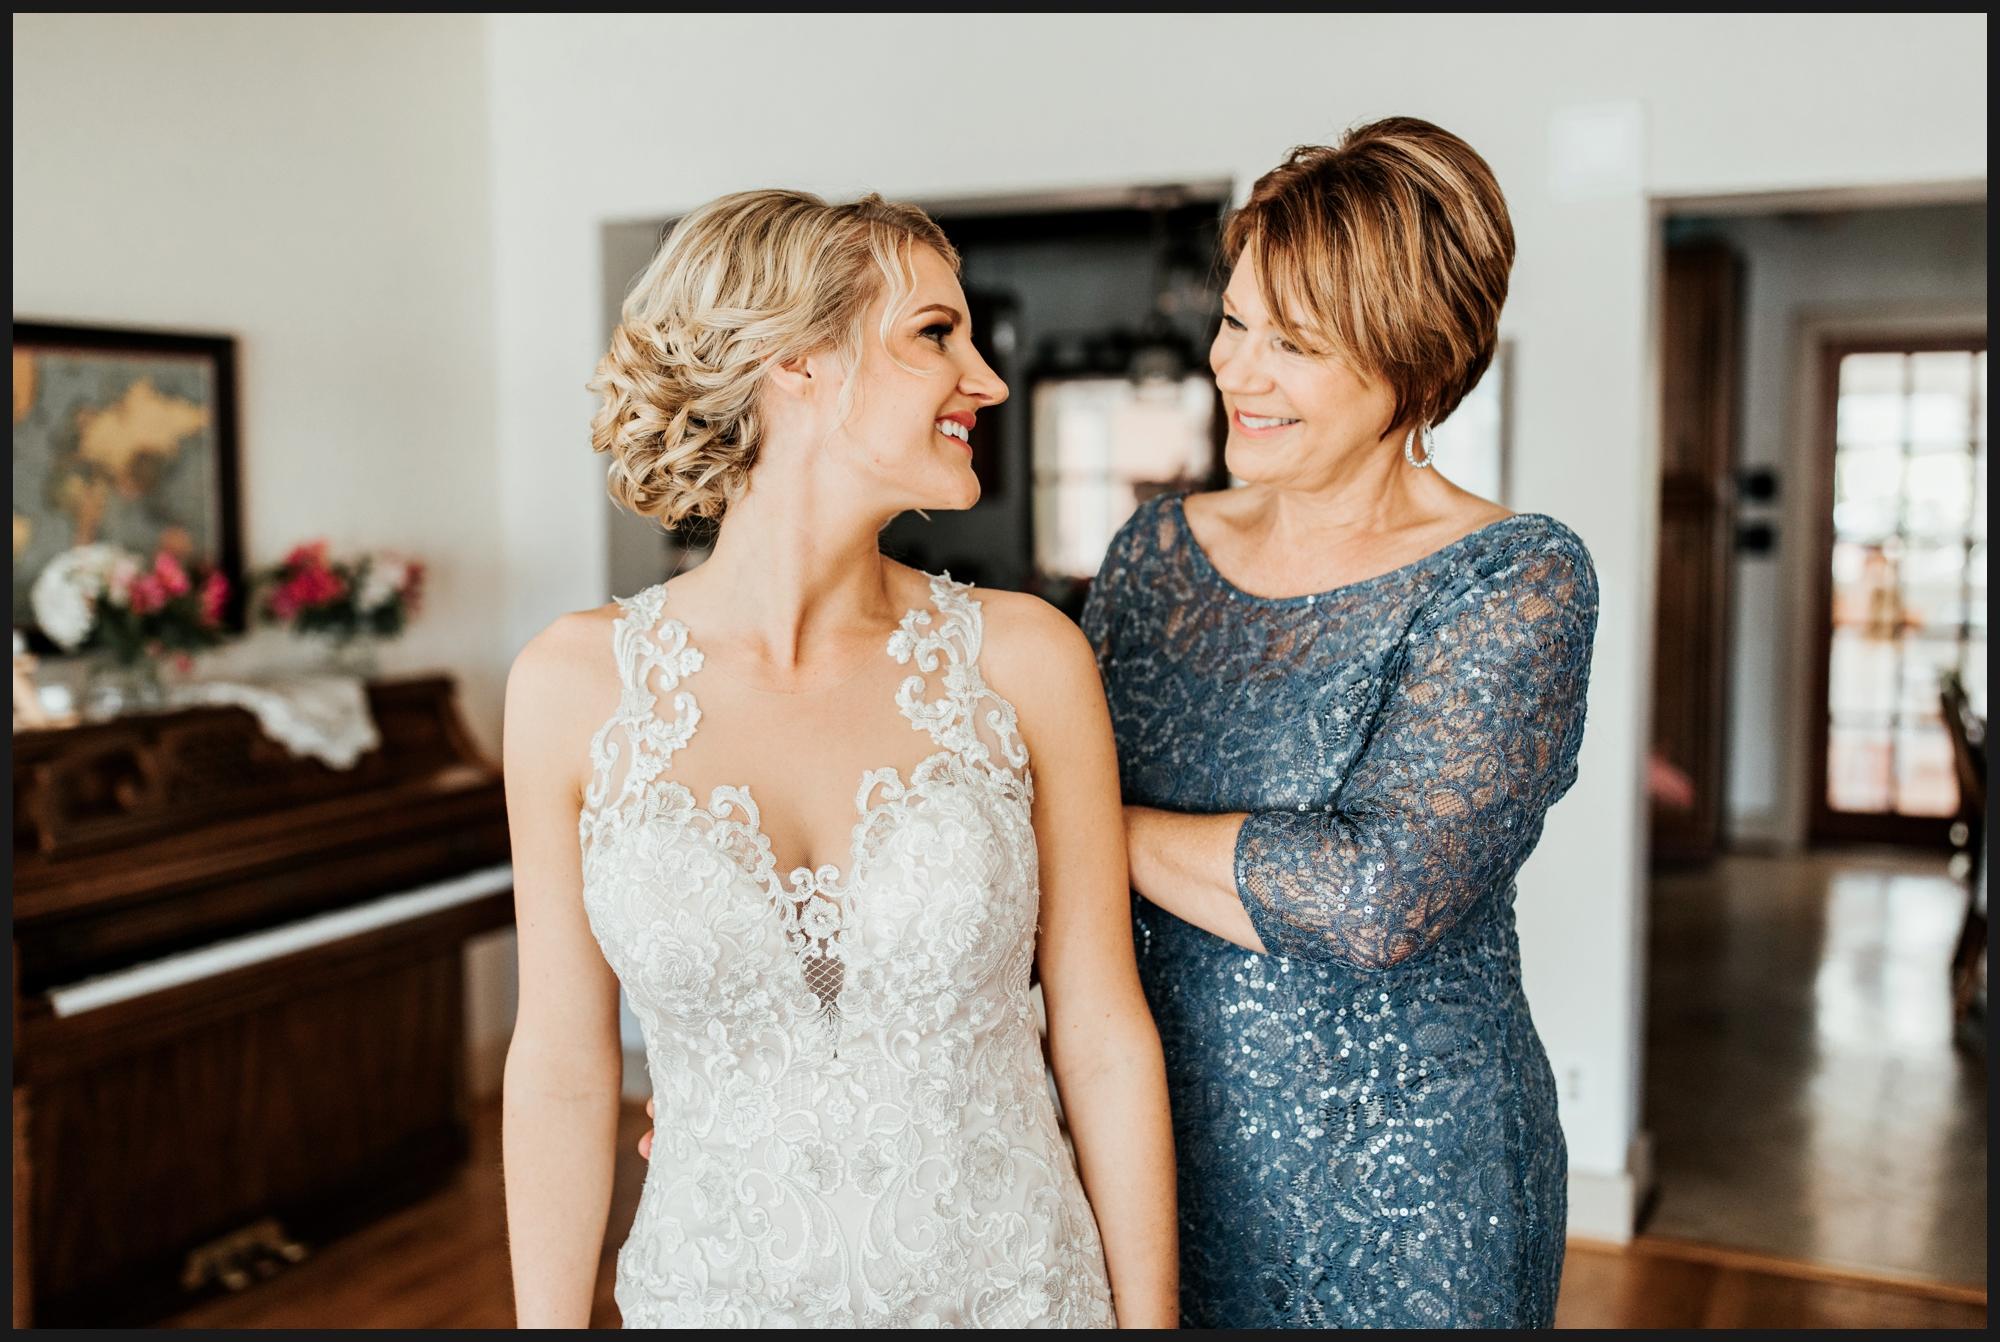 Orlando-Wedding-Photographer-destination-wedding-photographer-florida-wedding-photographer-hawaii-wedding-photographer_0563.jpg